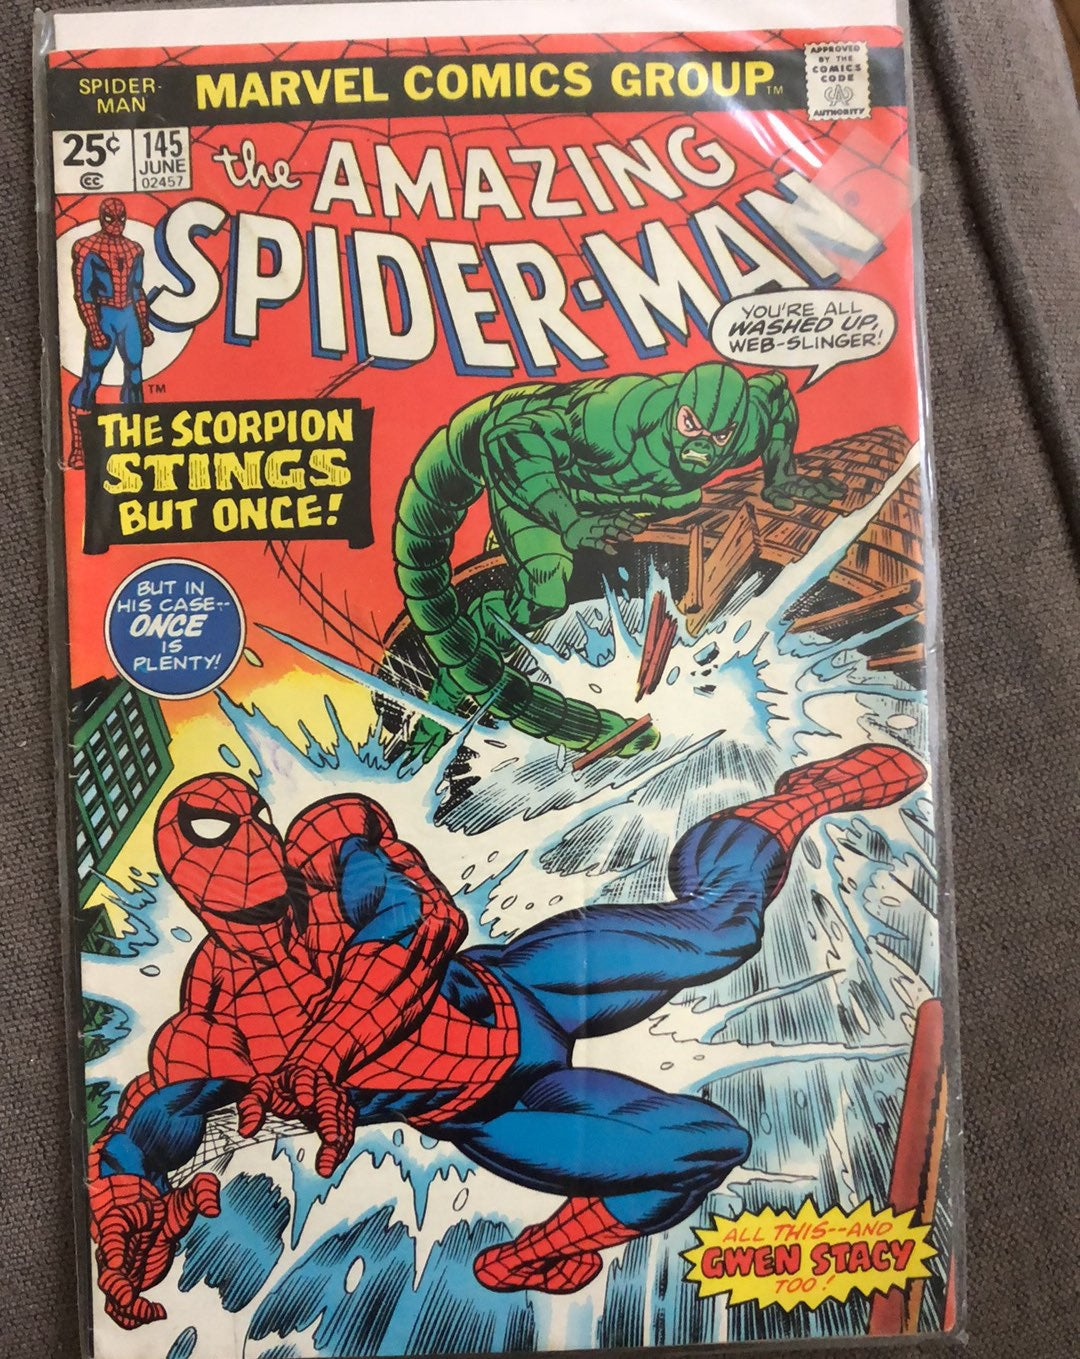 The Amazing Spider-Man #145 FN Scorpion